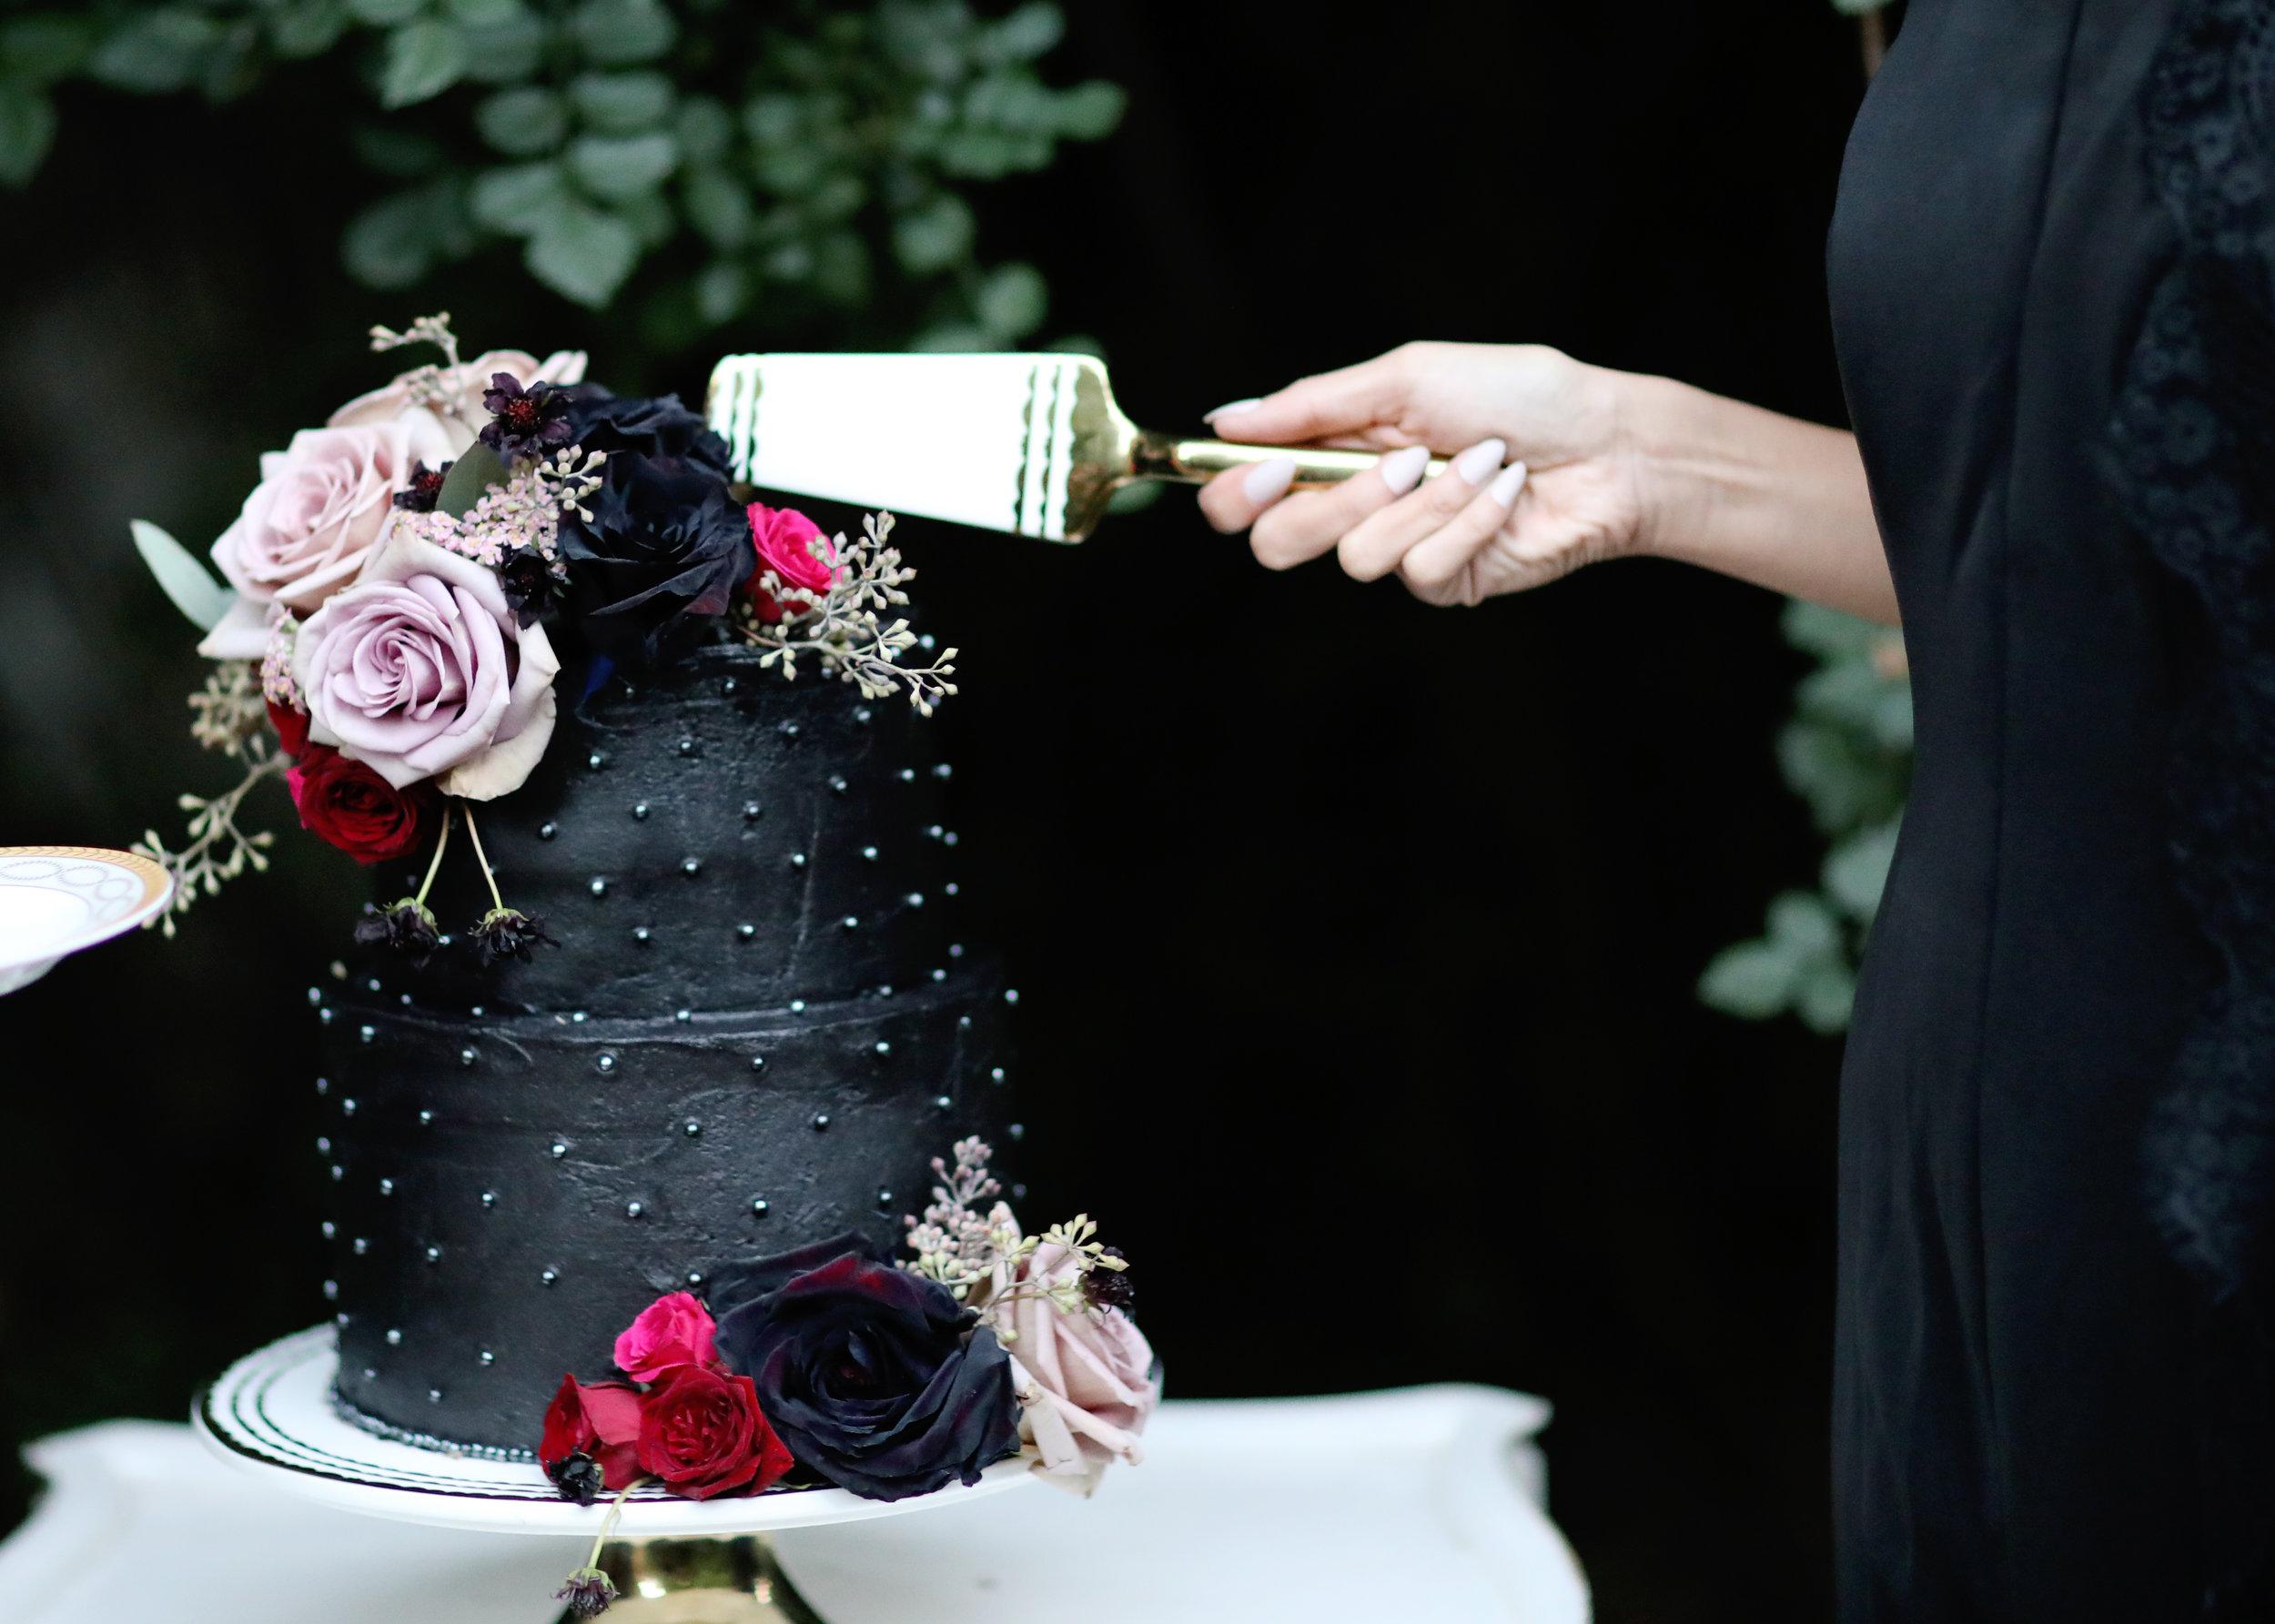 Black wedding cake with vintage rental cake plate and matching cake server.